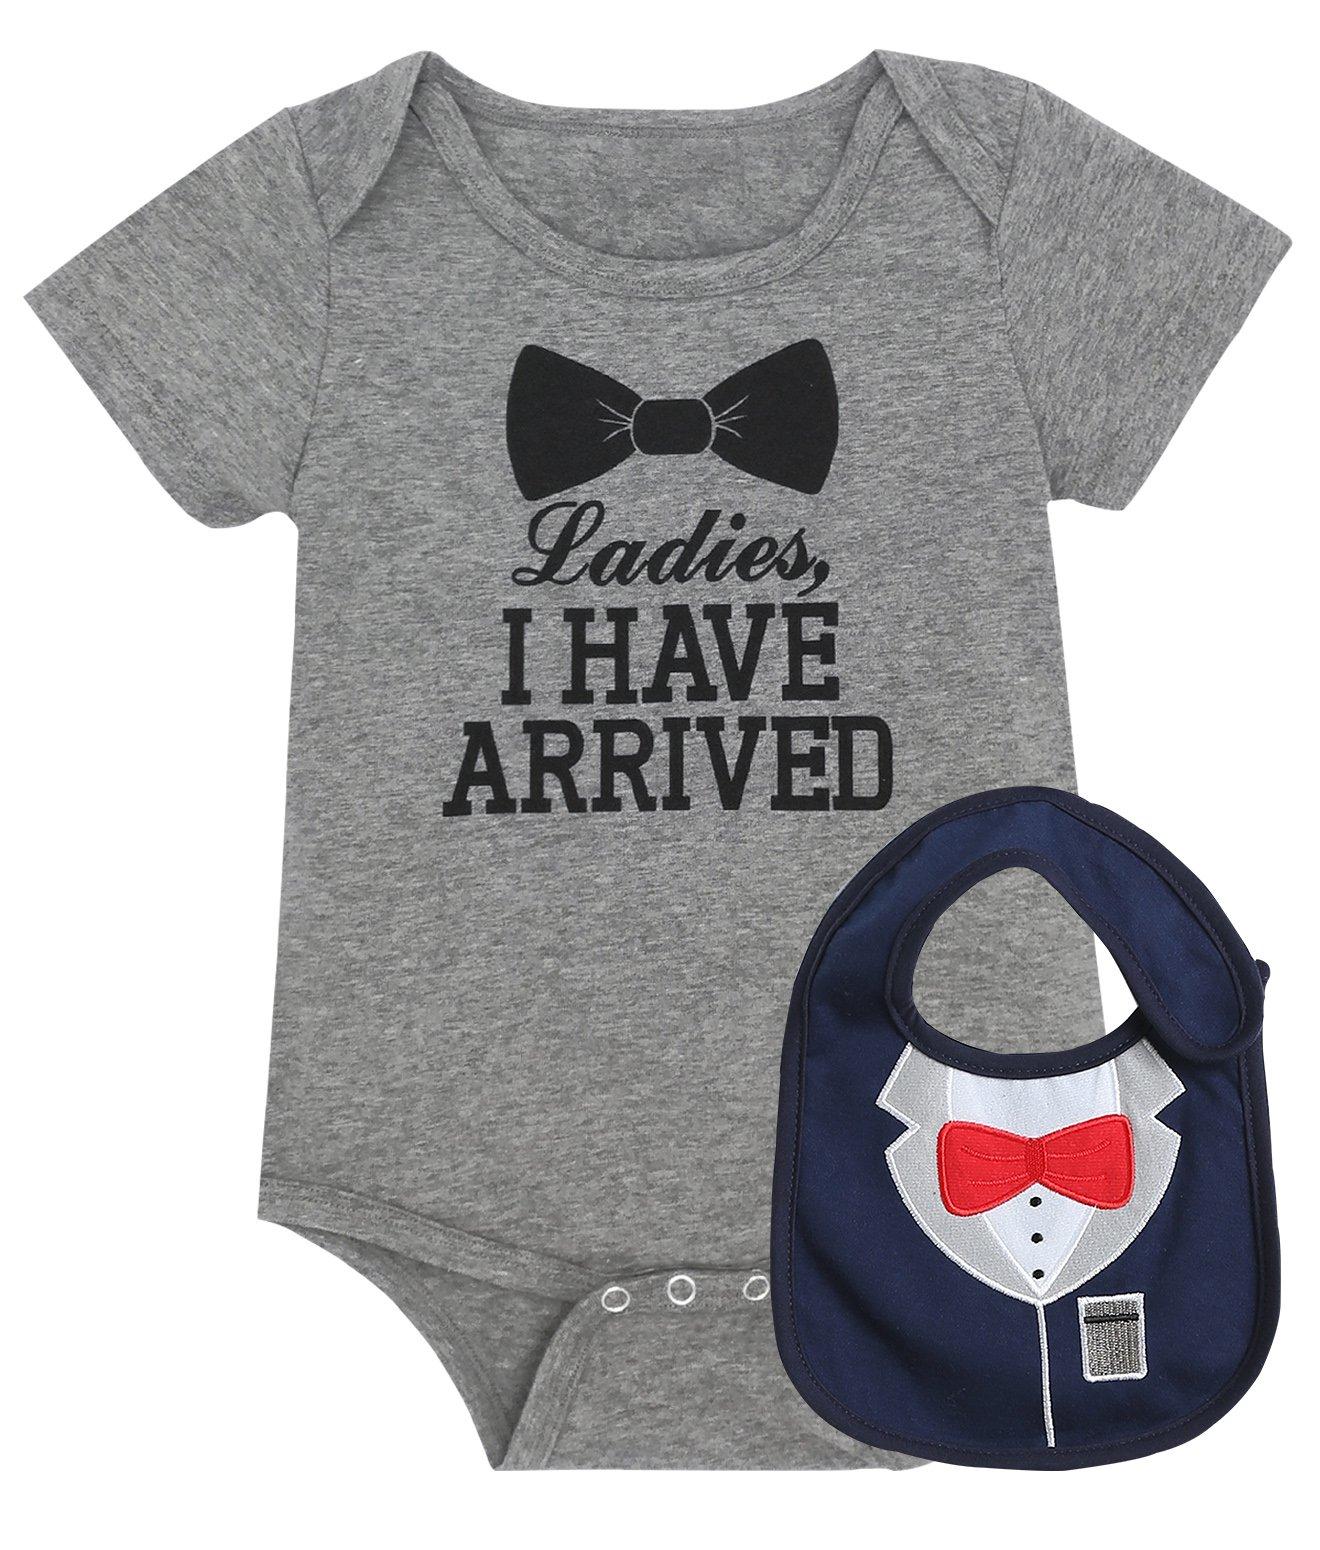 iCrazy Baby Boys' Funny Gentleman bodysuit with Bib (3-6 Months, Gray)